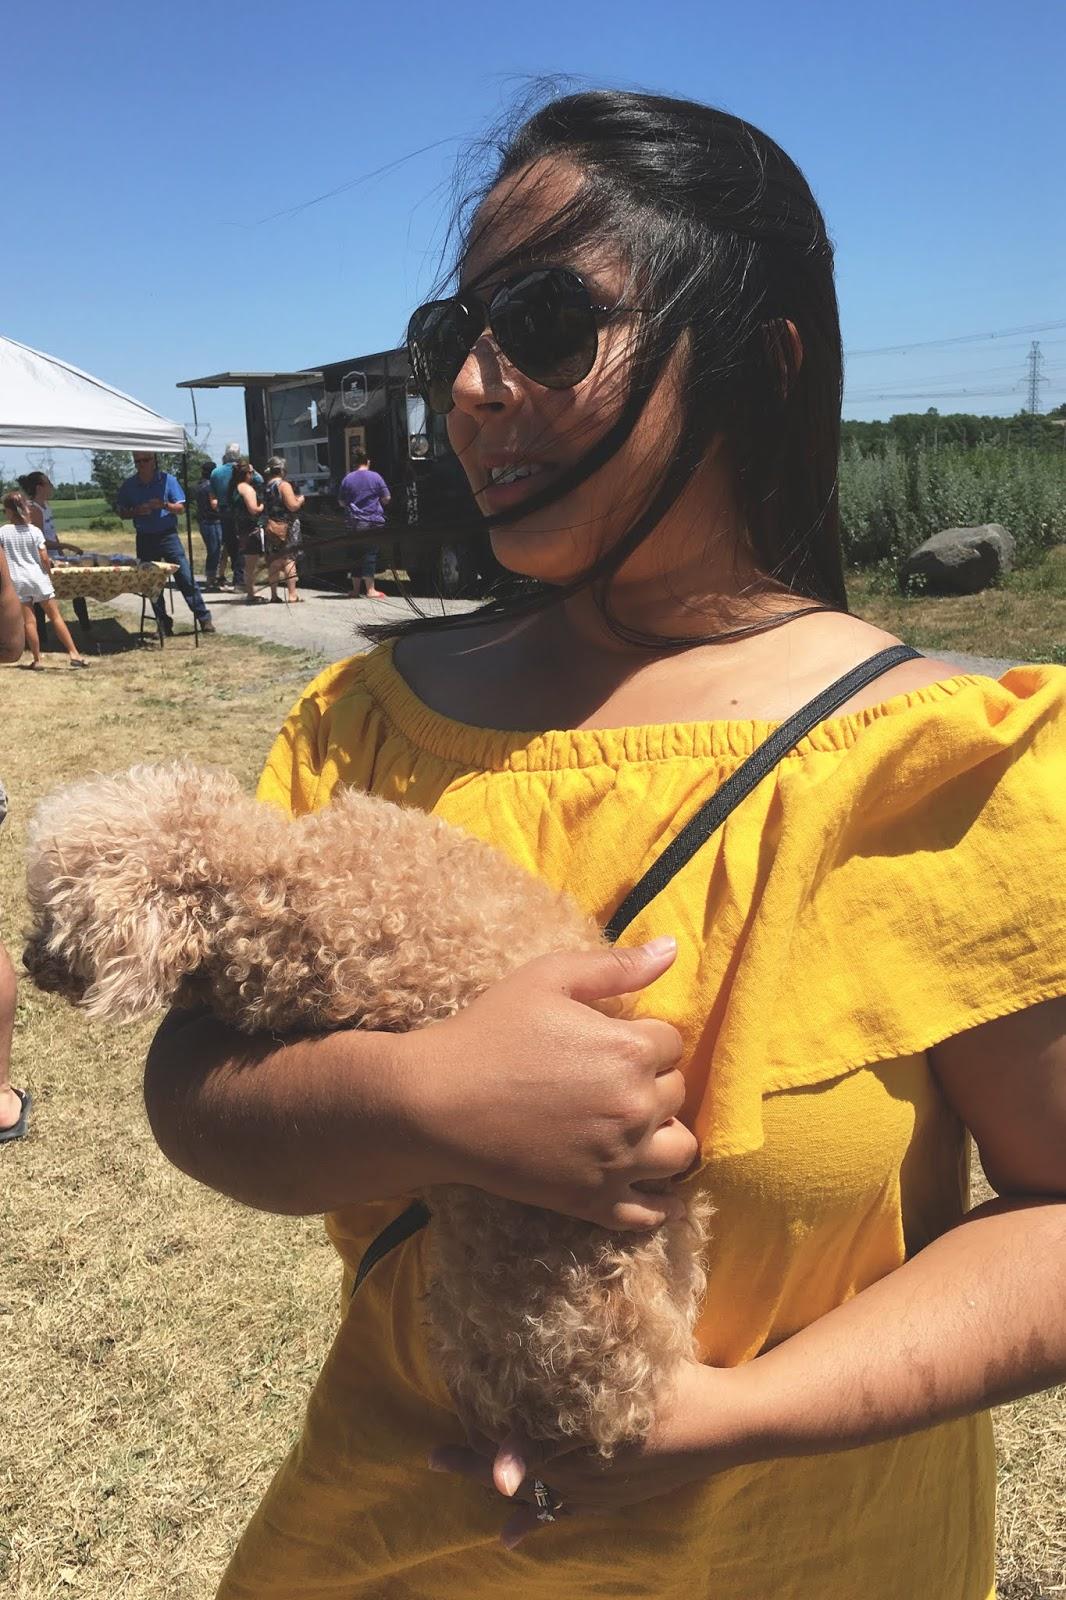 Rosalyn Gambhir - Life Update & Tips on Blogging